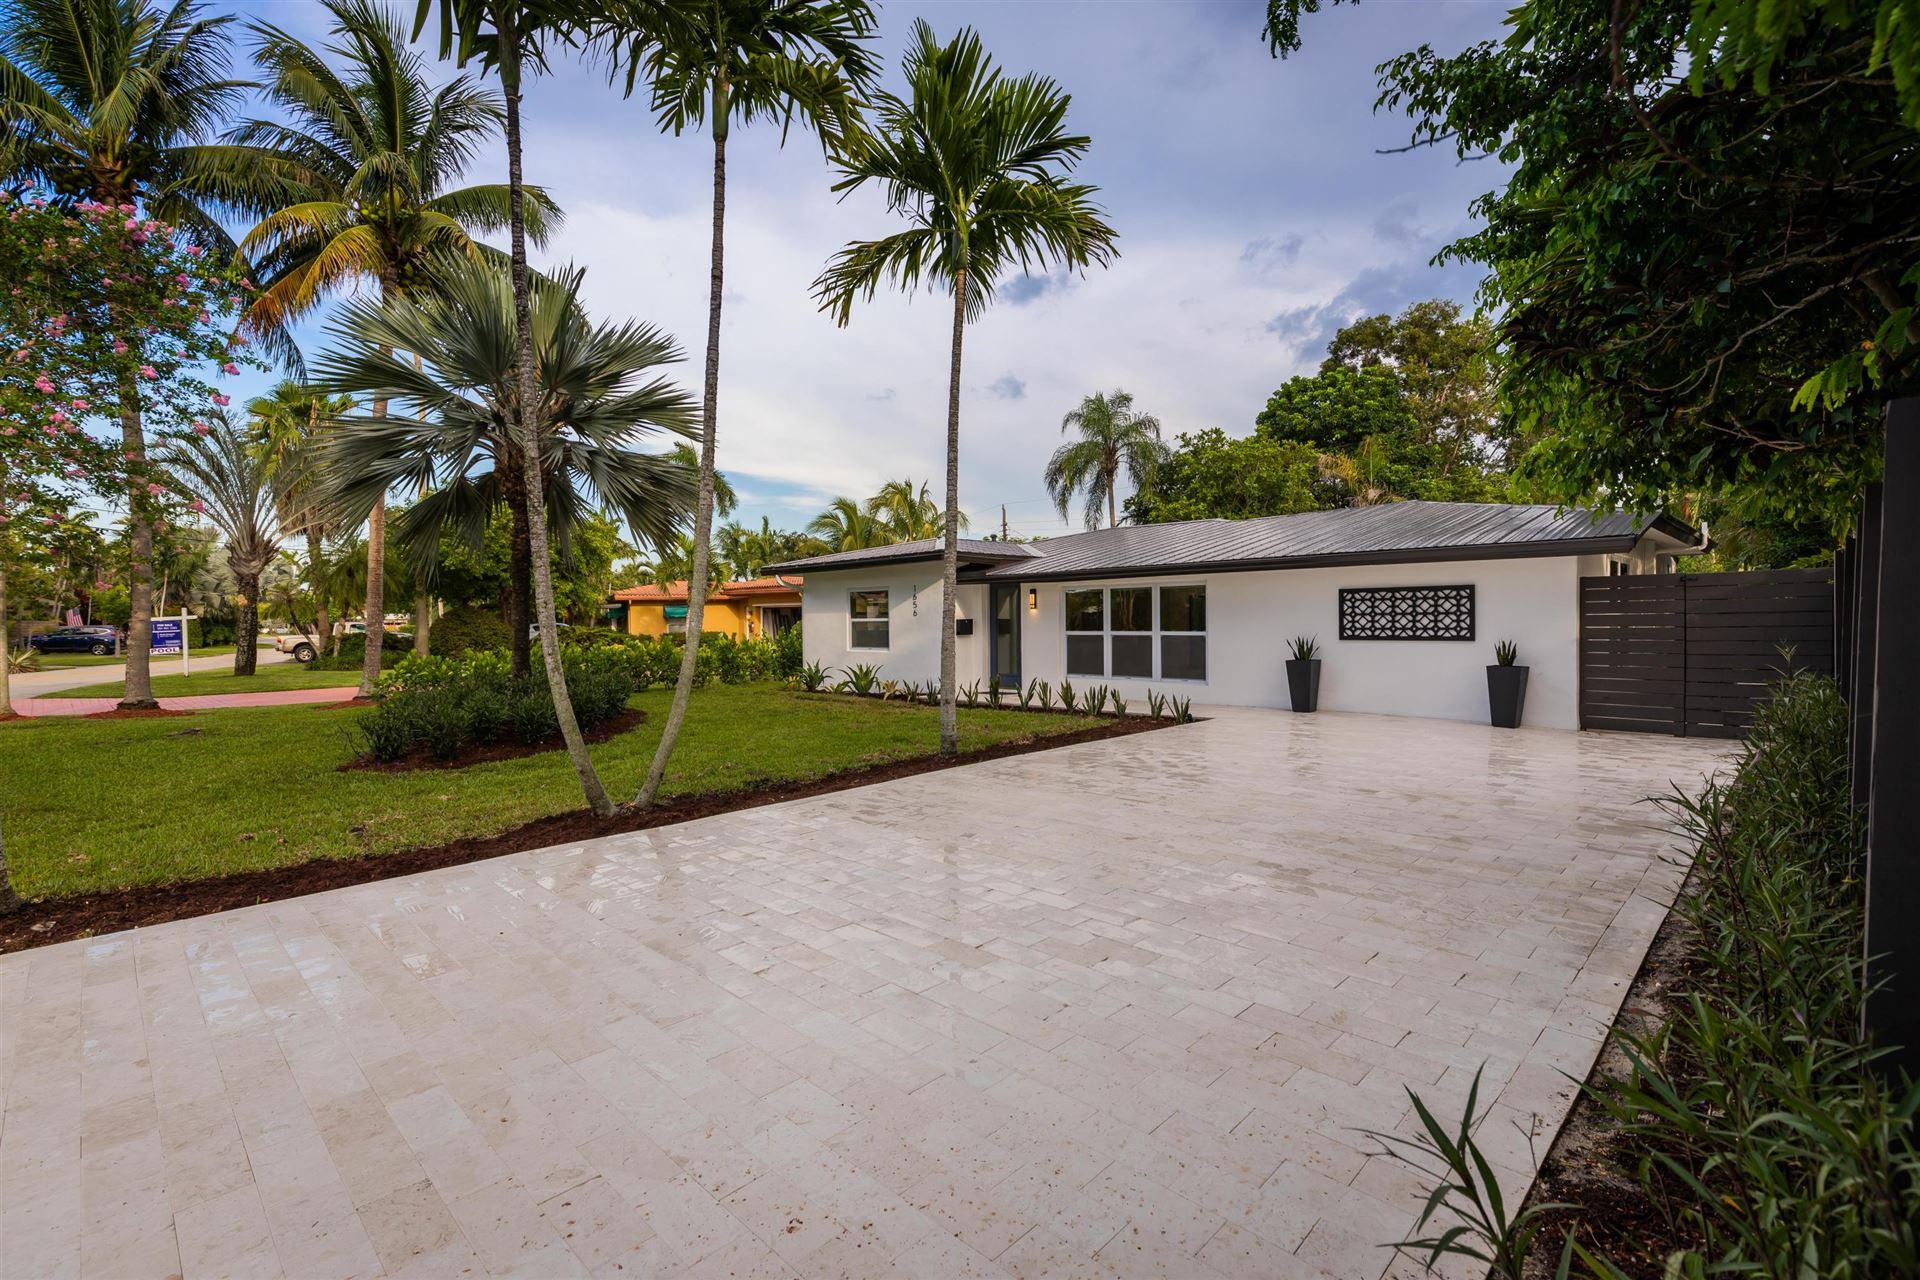 1656 Poinsettia Drive, Fort Lauderdale, FL 33305 - #: RX-10650431